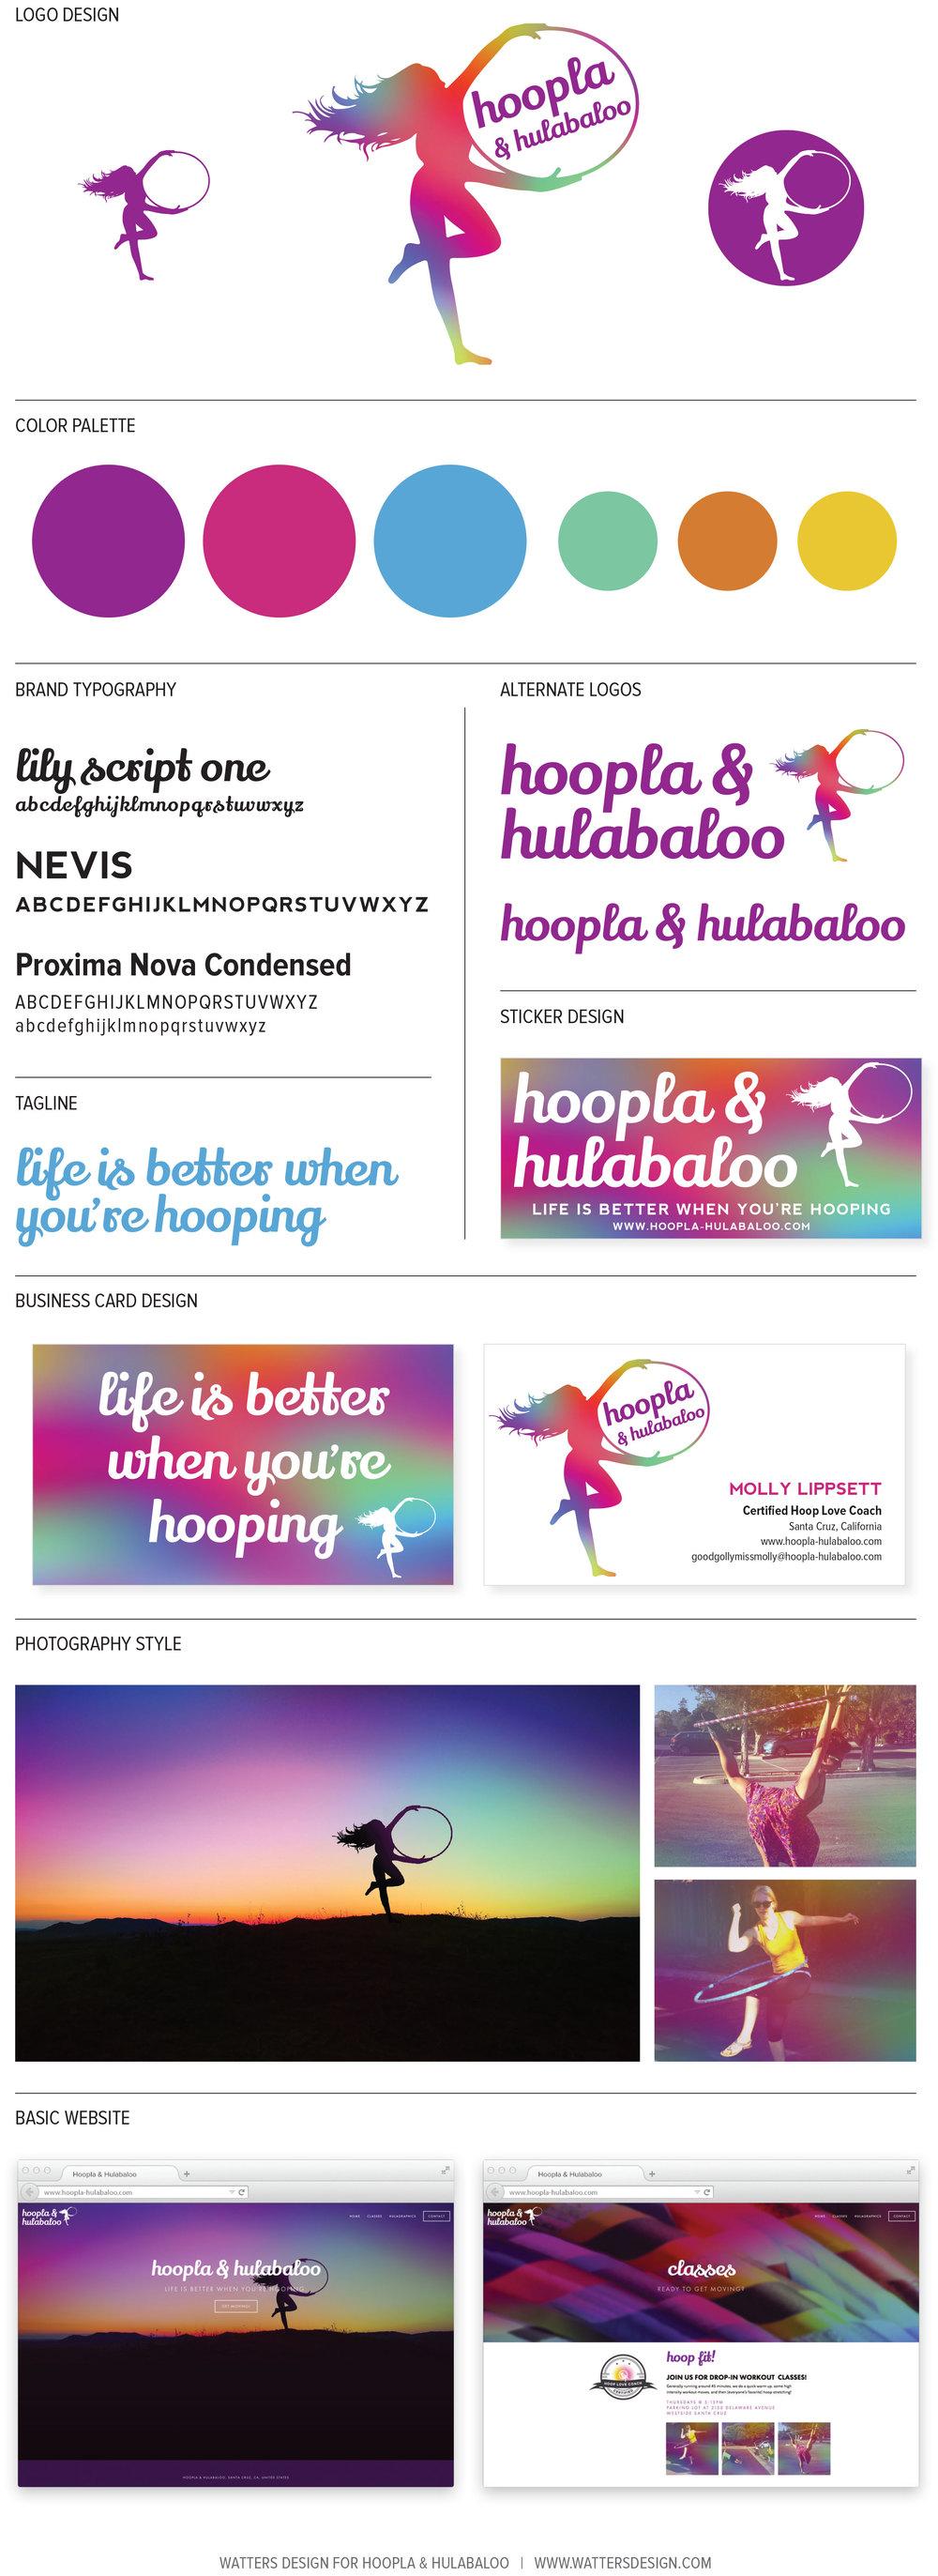 Hoopla-Hulabaloo_Style.jpg